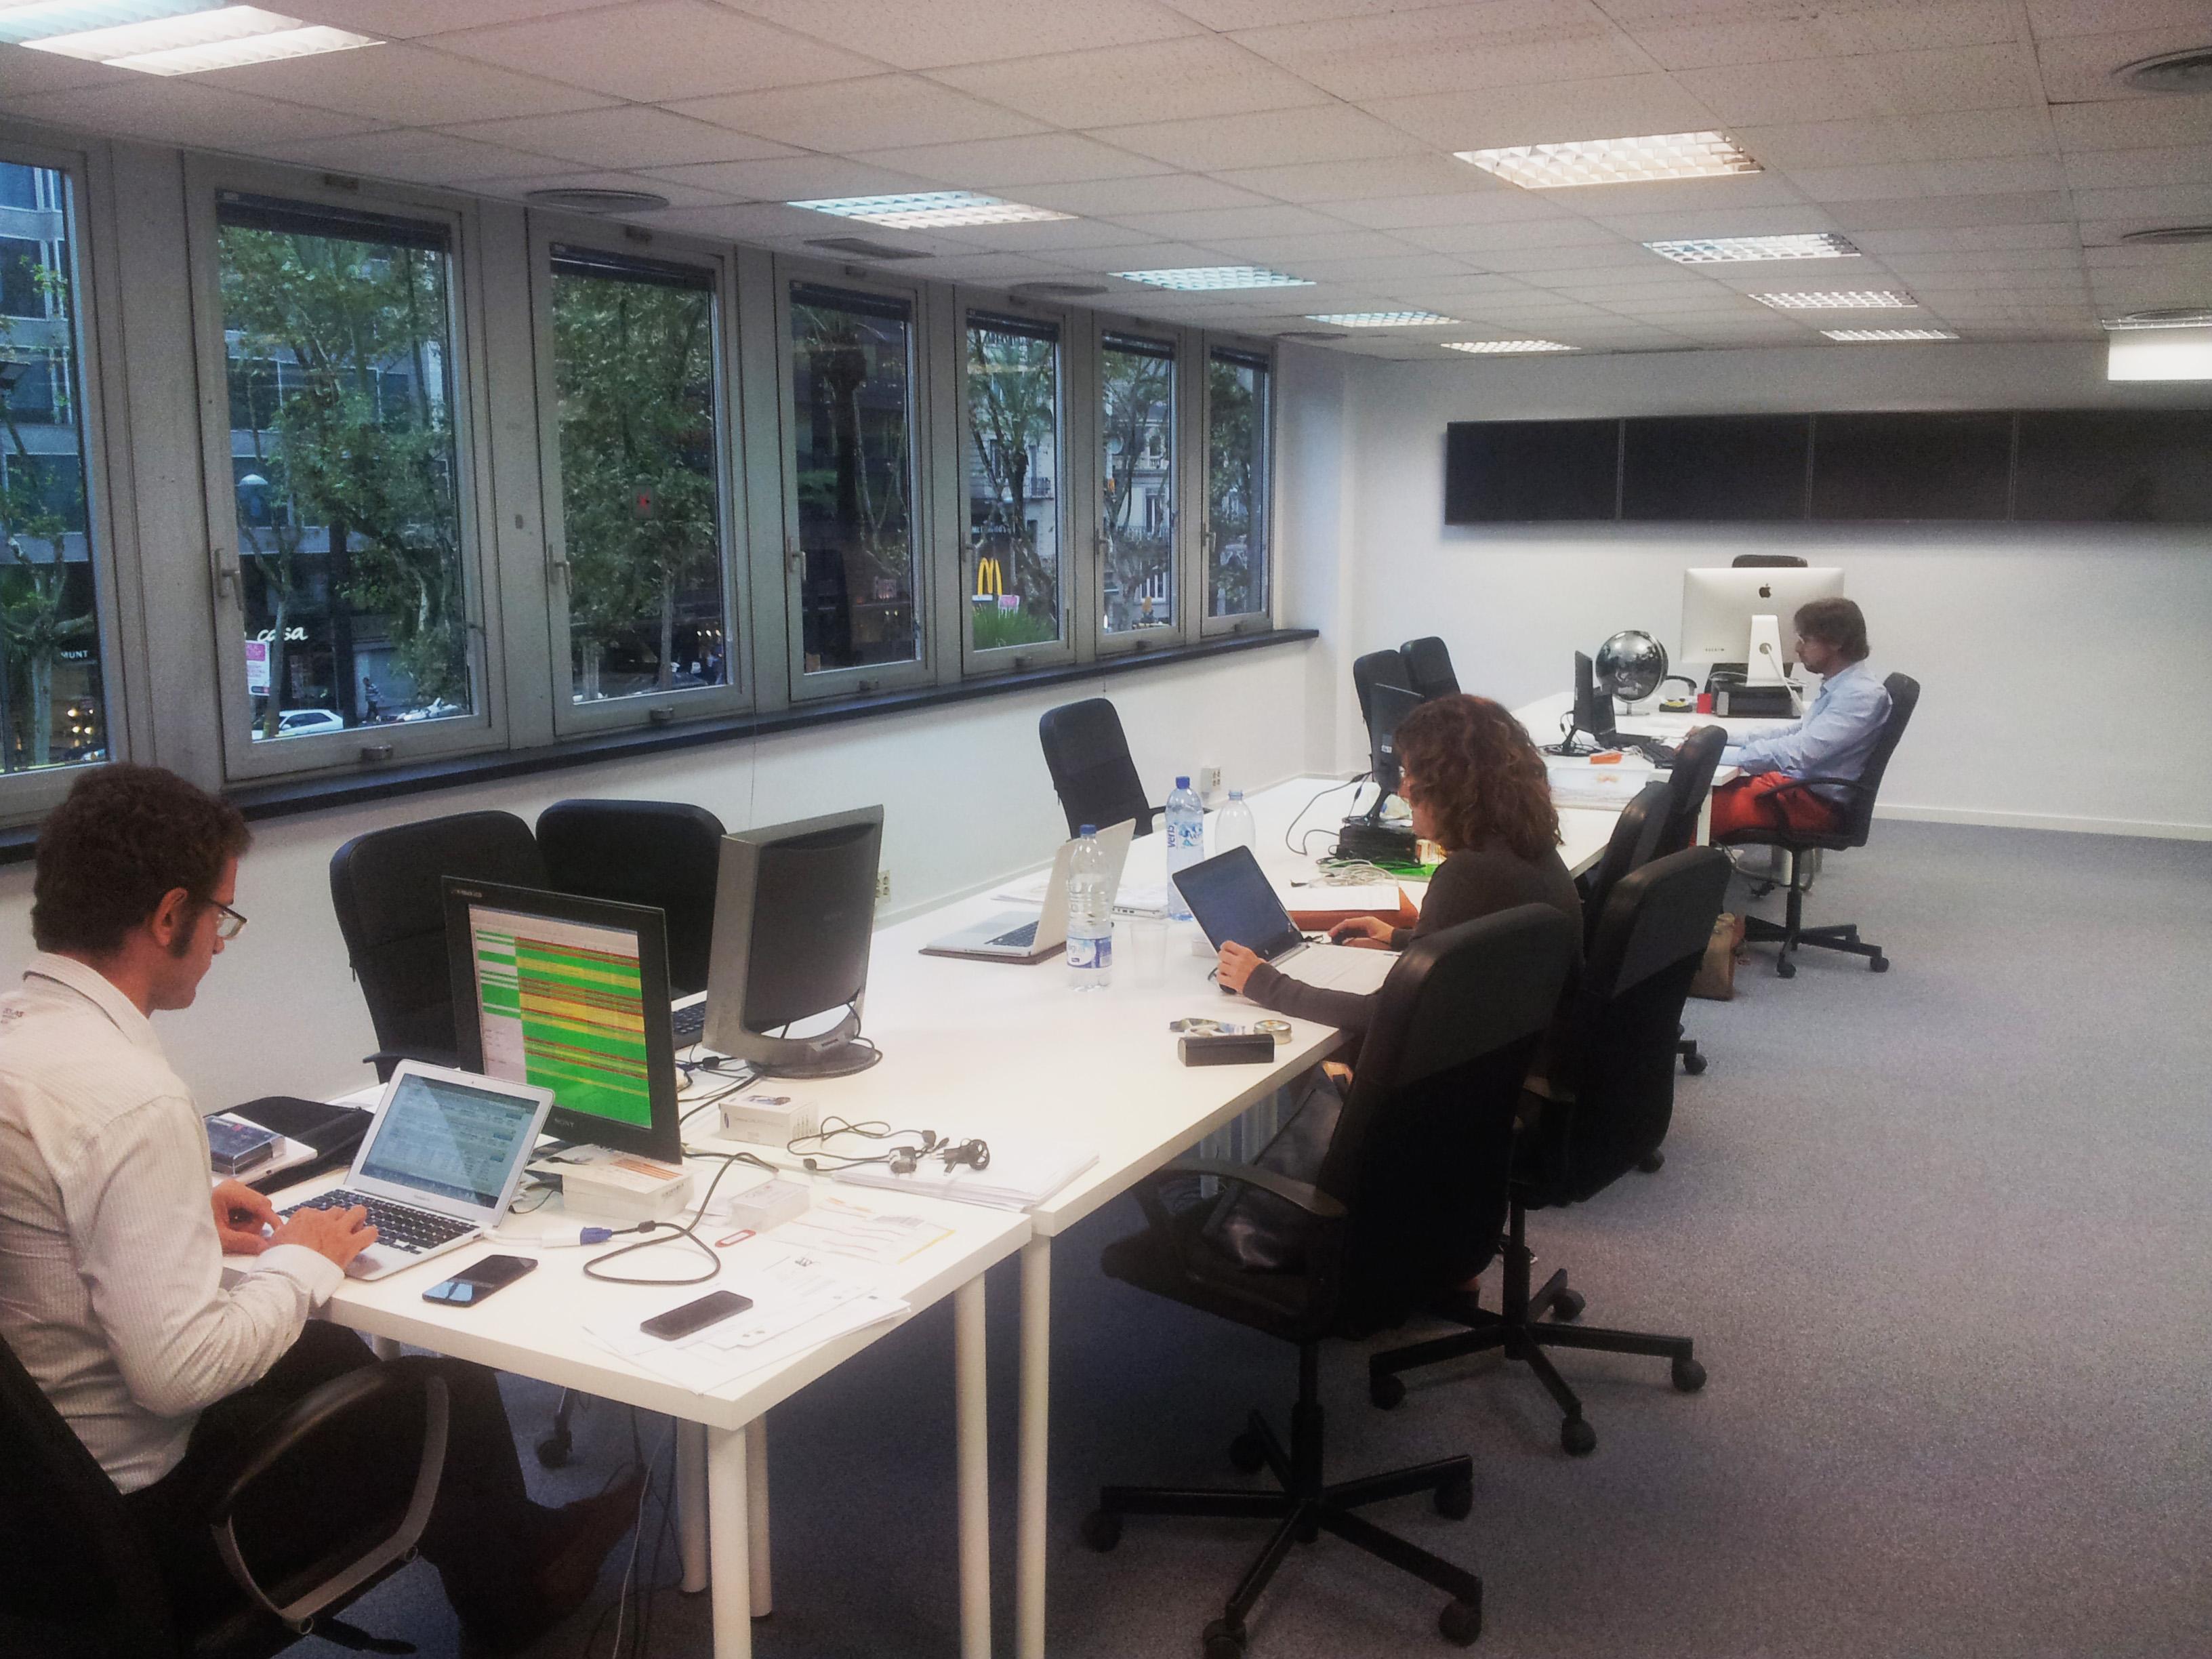 Estrenamos nueva oficina en barcelona call2world for Oficina ups barcelona